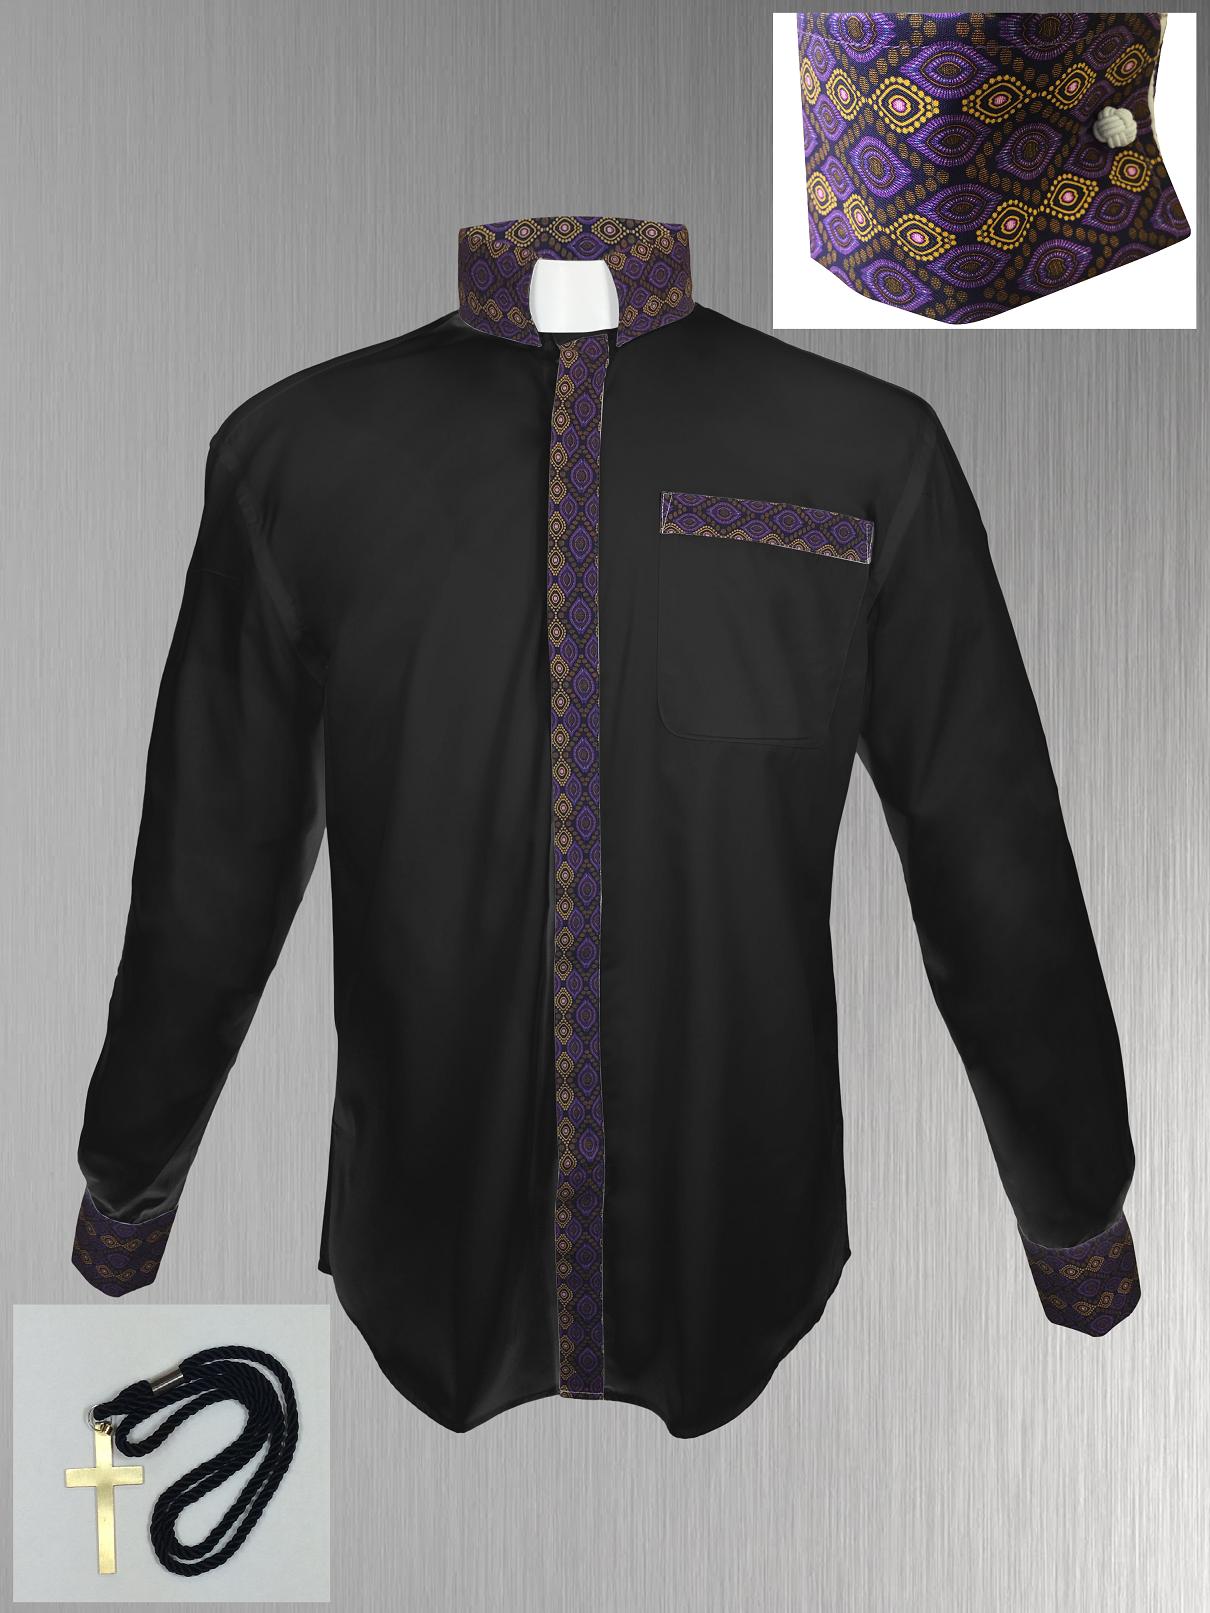 149. Custom Edition Gimba Cloth Men's Tab Collar Clergy Shirt Set - Black